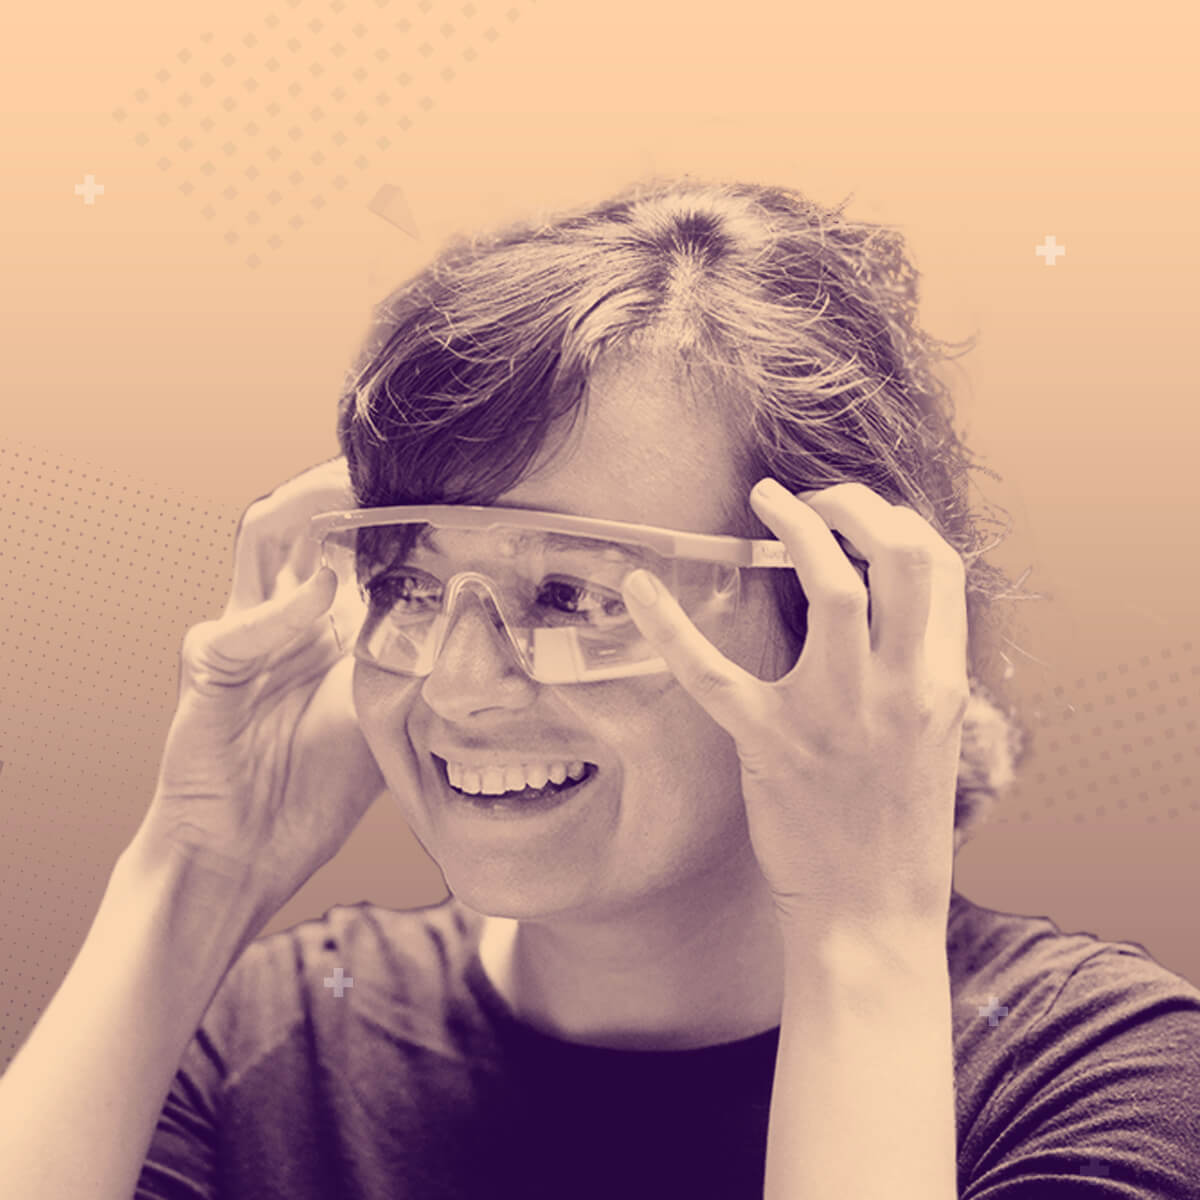 UXINDIA 2018 speaker Katya_Kostyukova